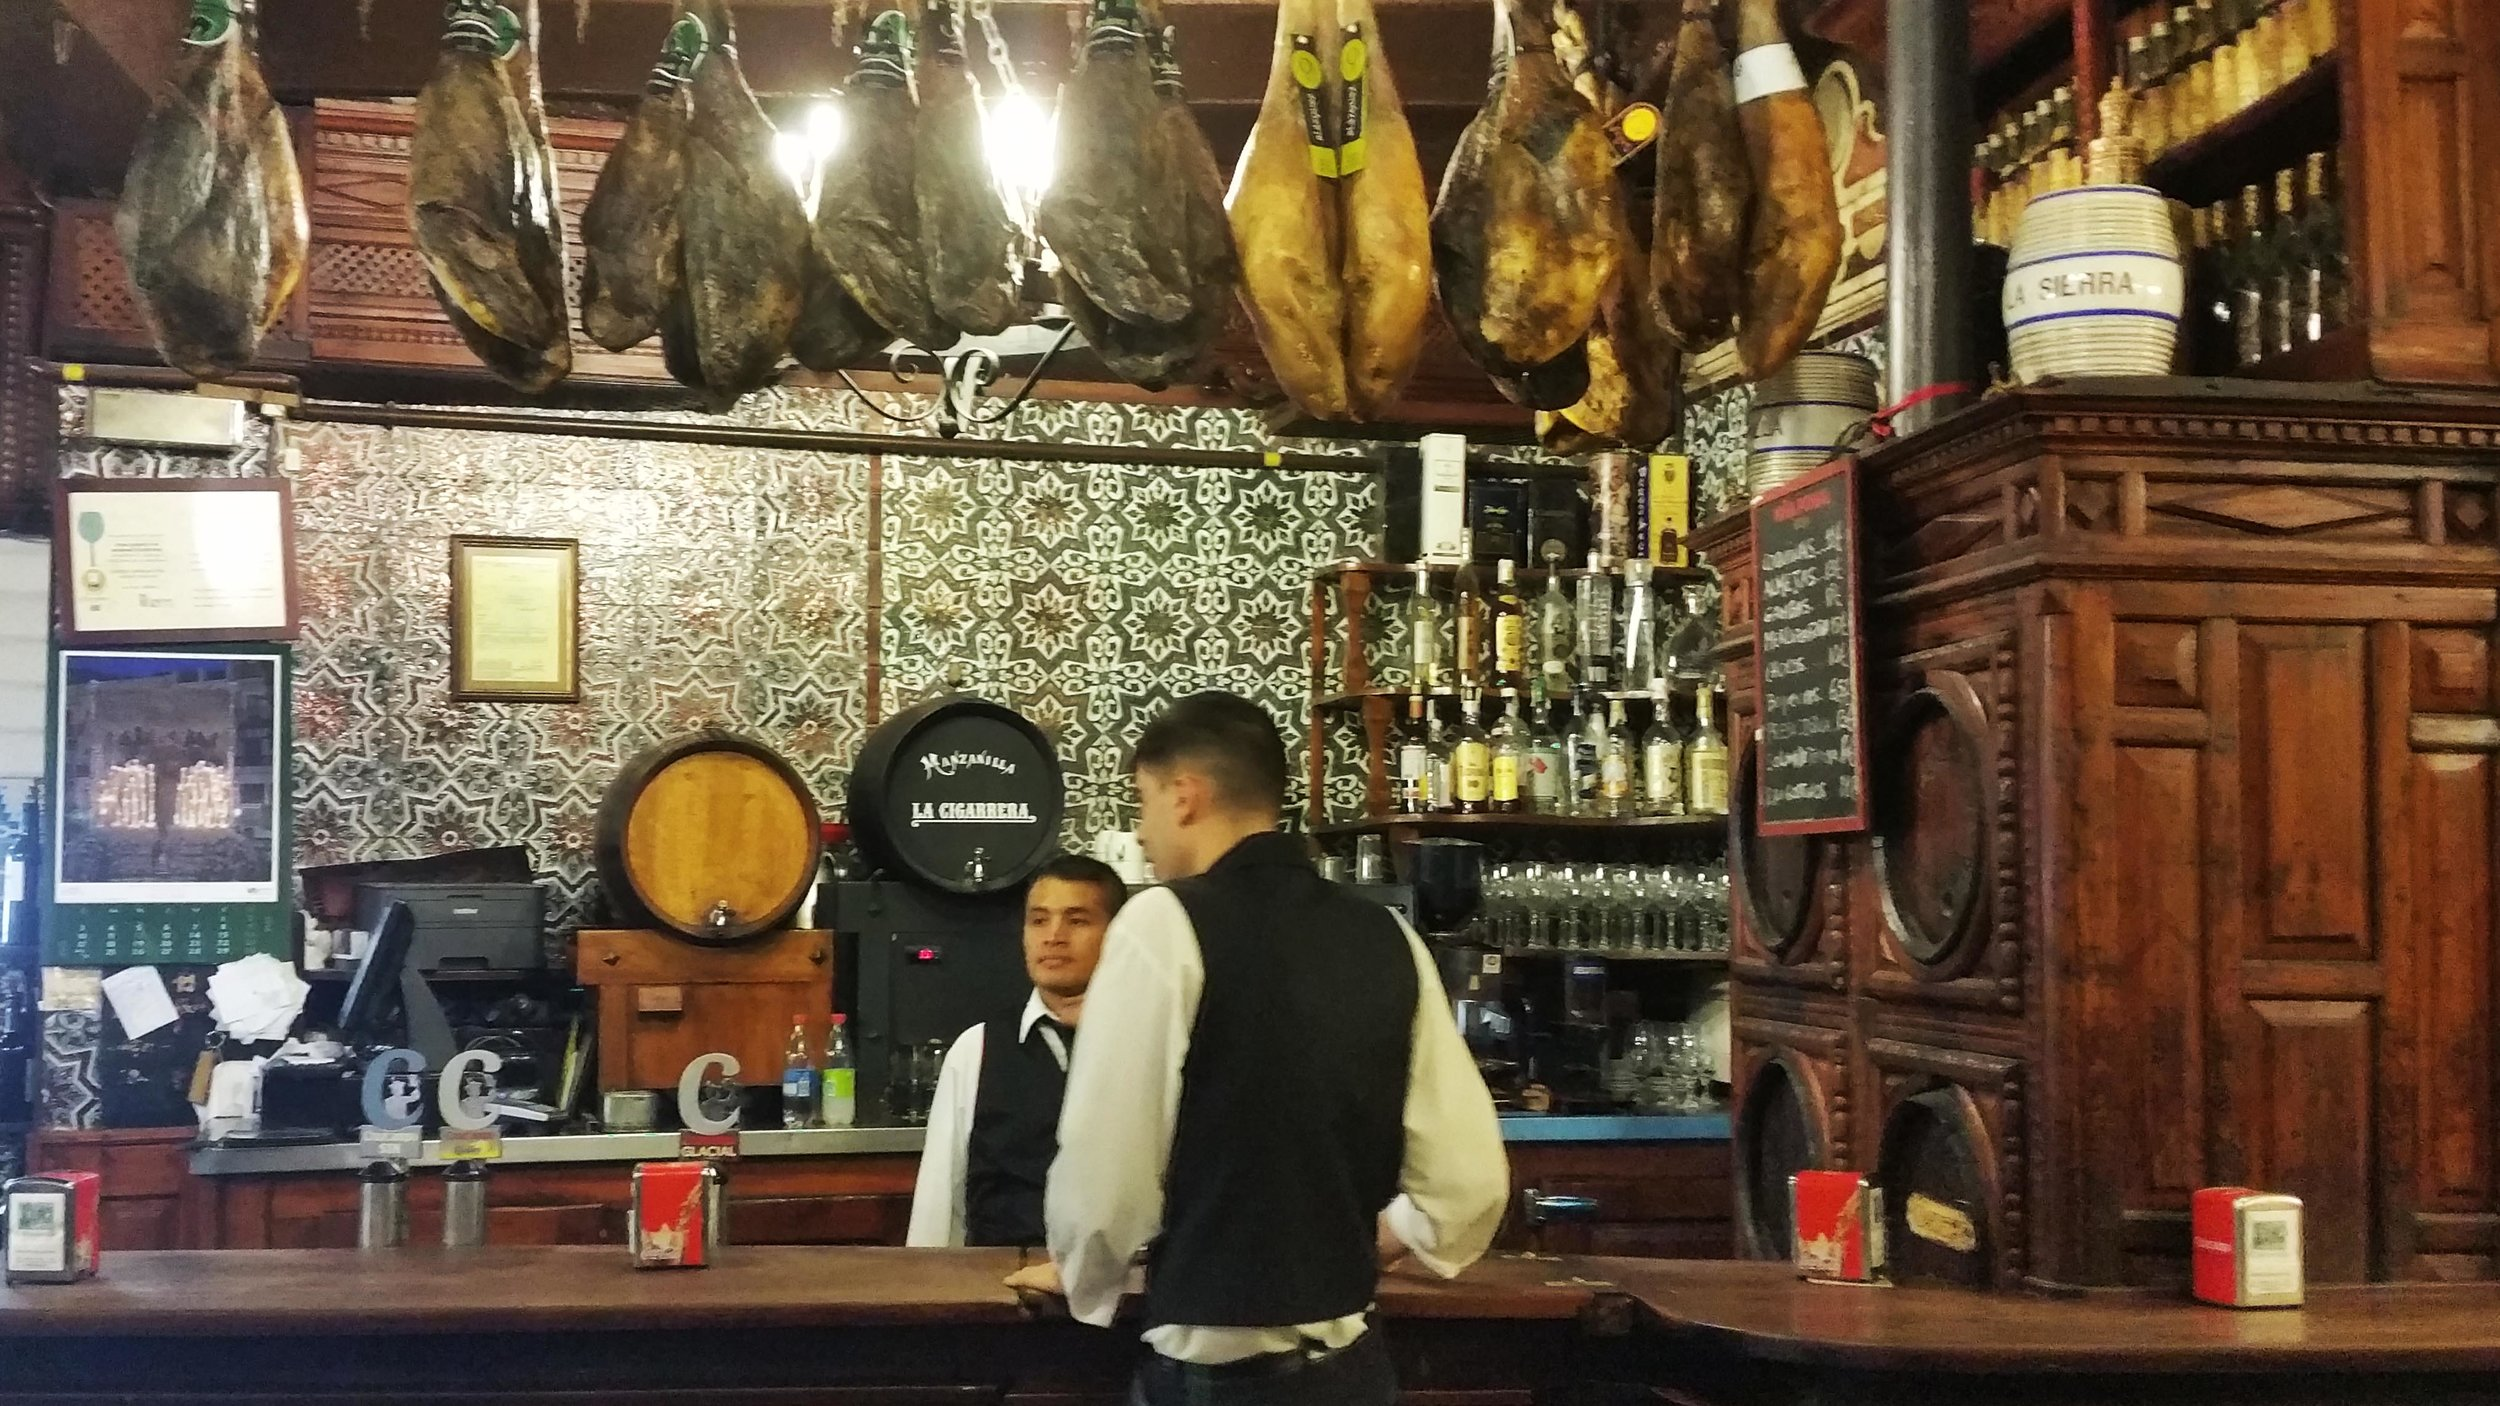 El-Rinconcillo-Seville.jpg